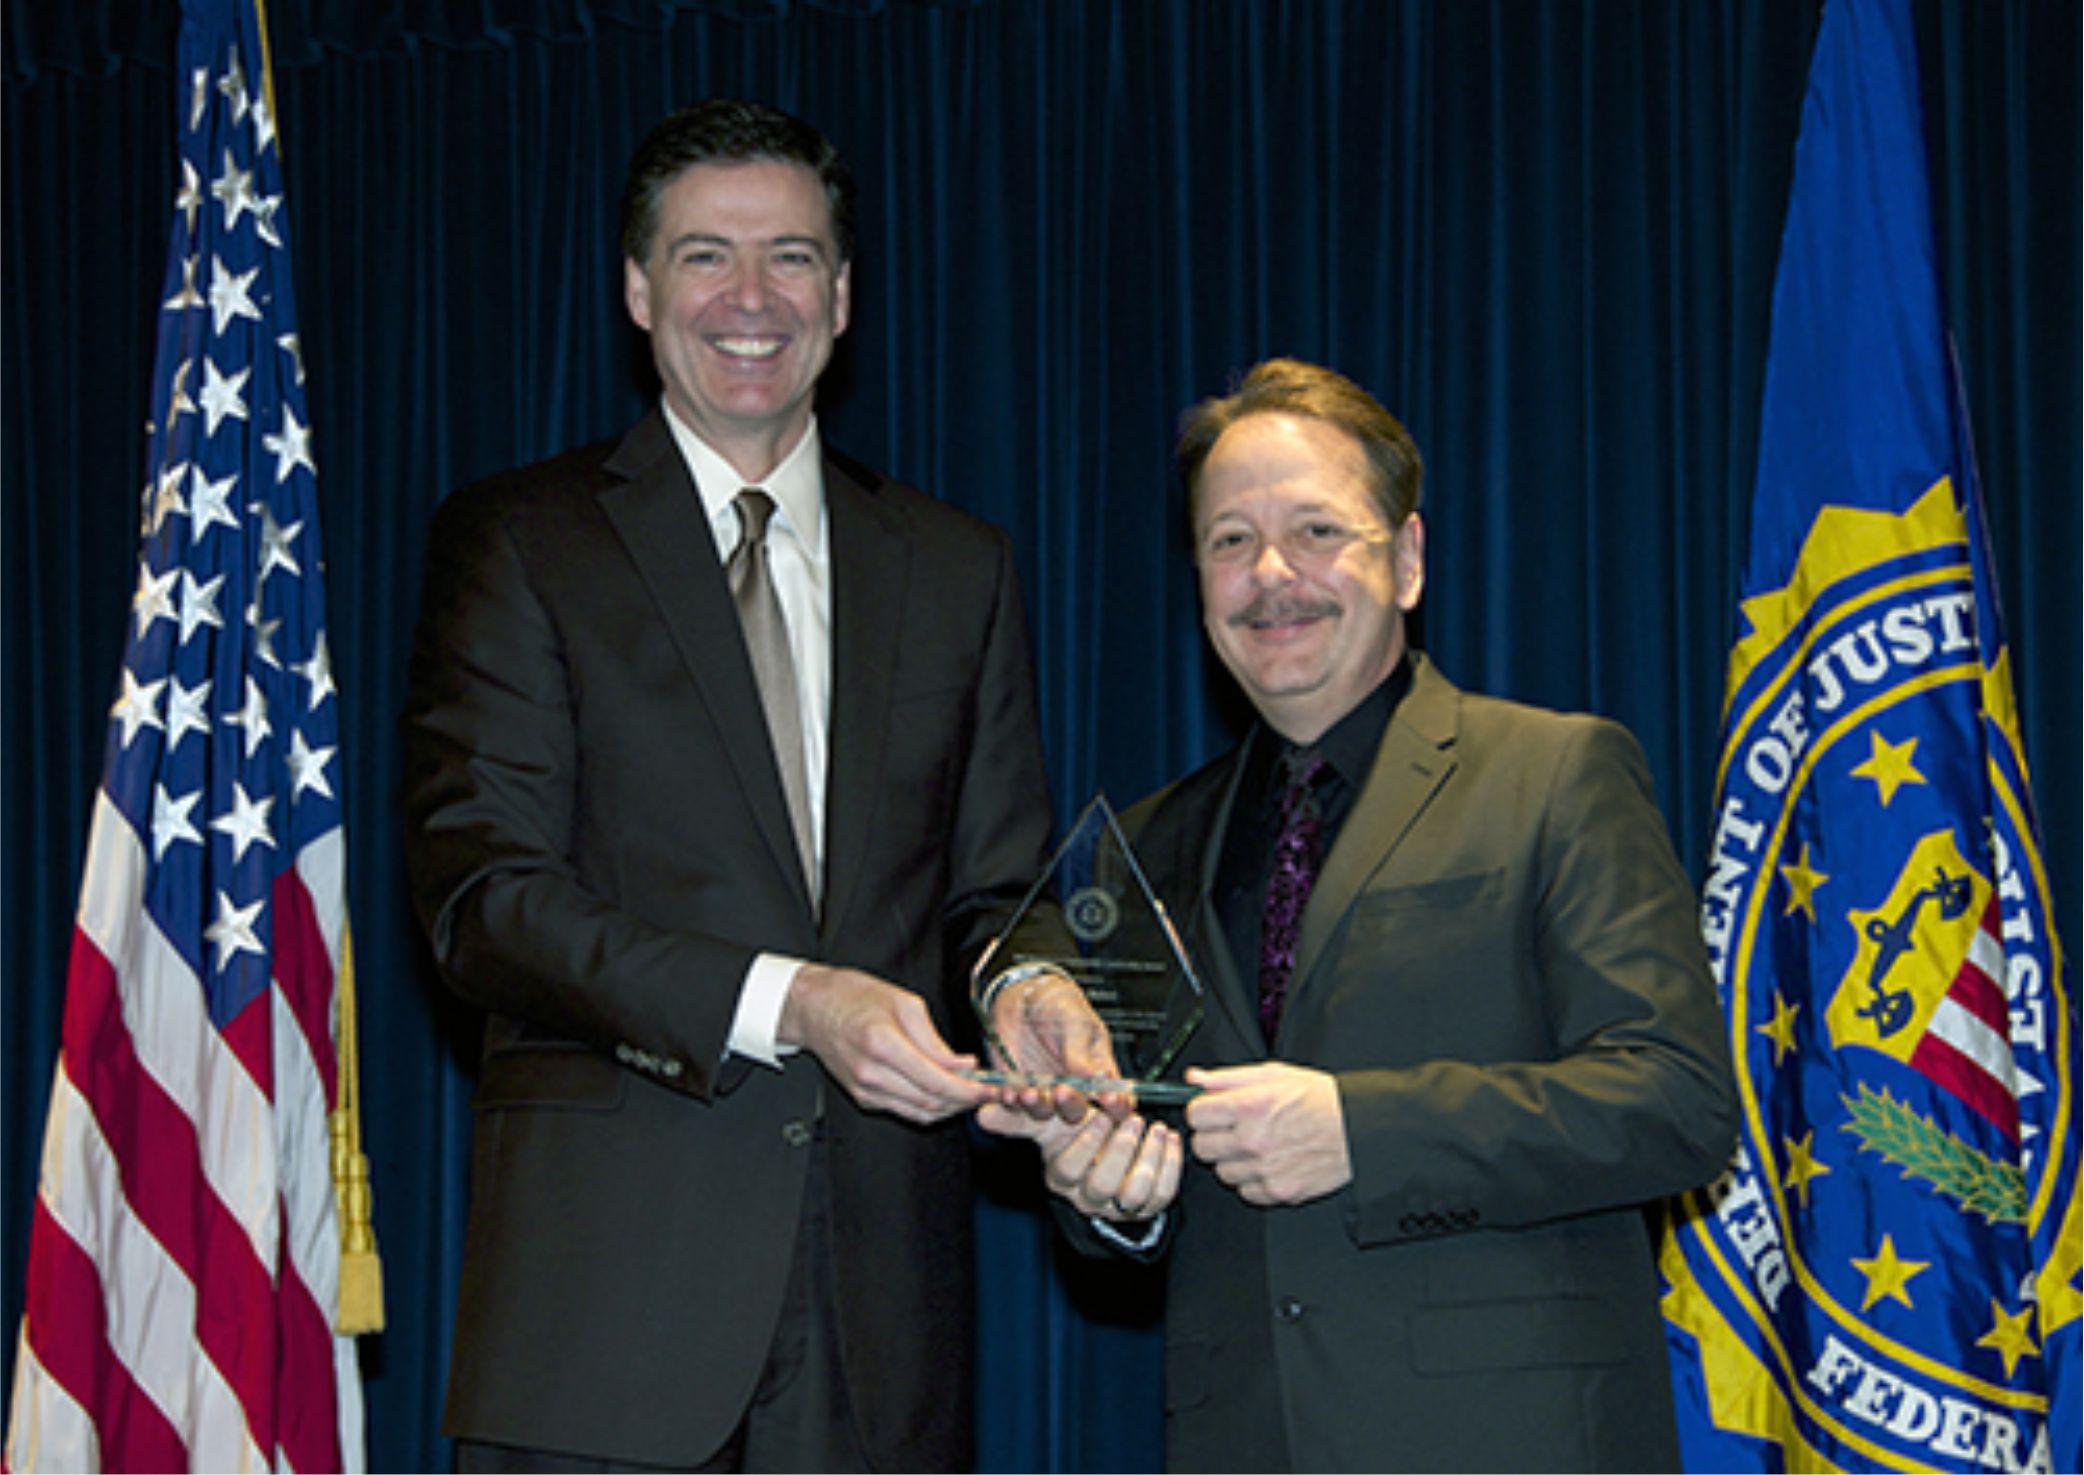 2013 FBI Director's Community Leadership Award